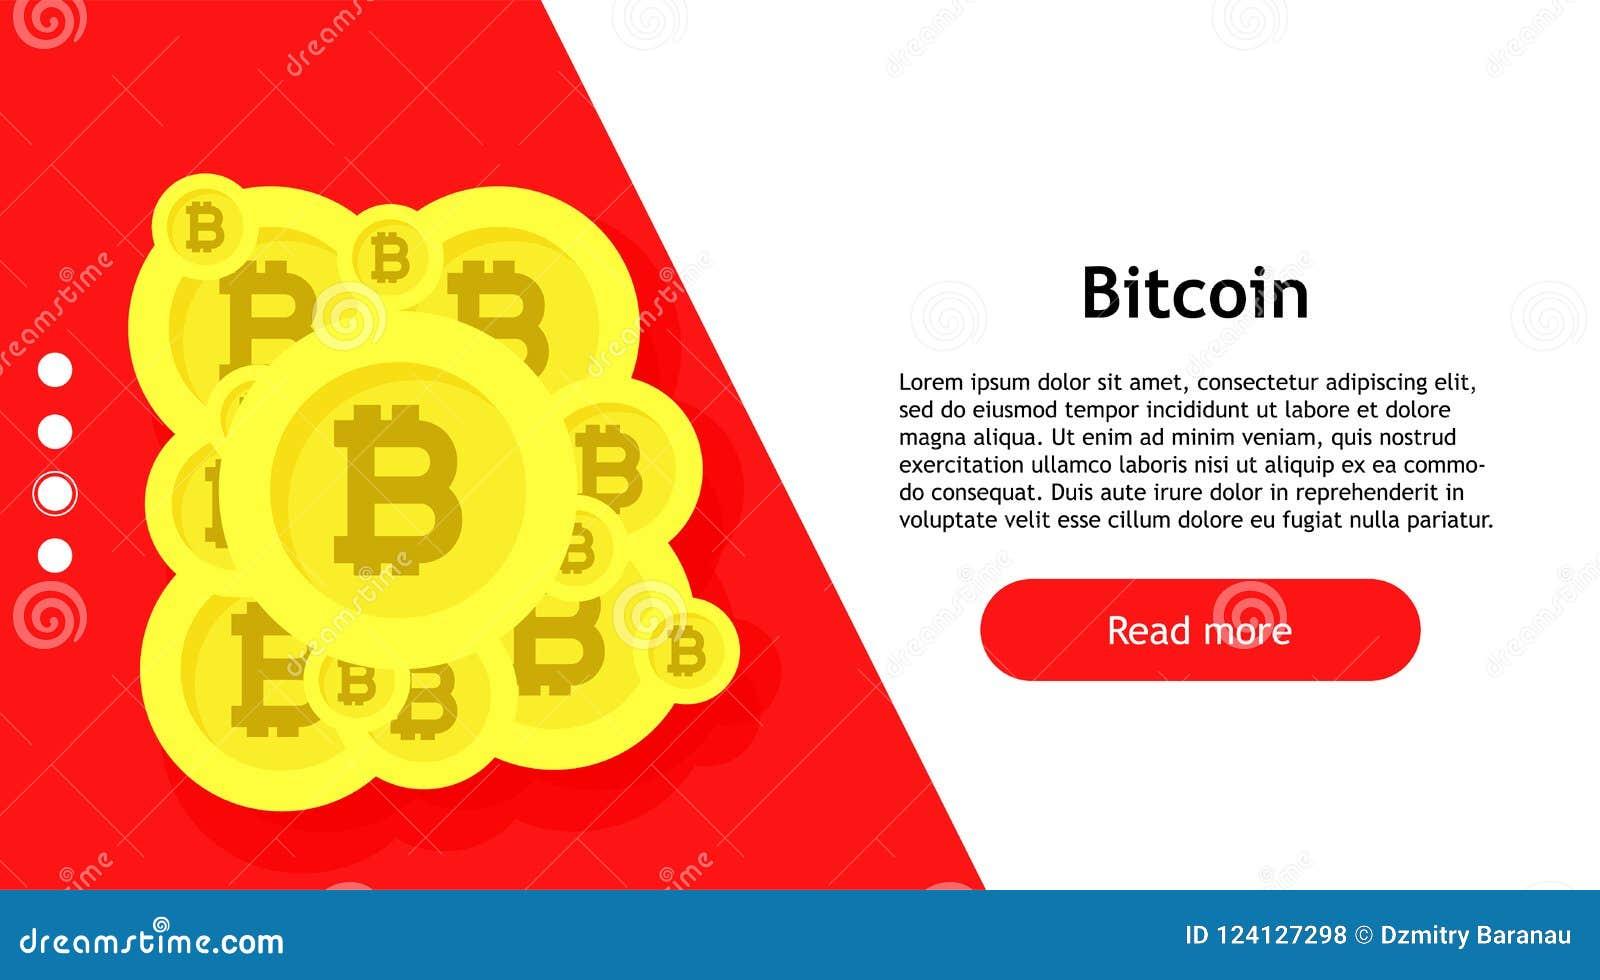 Bitcoin Extension - Google interneta veikals